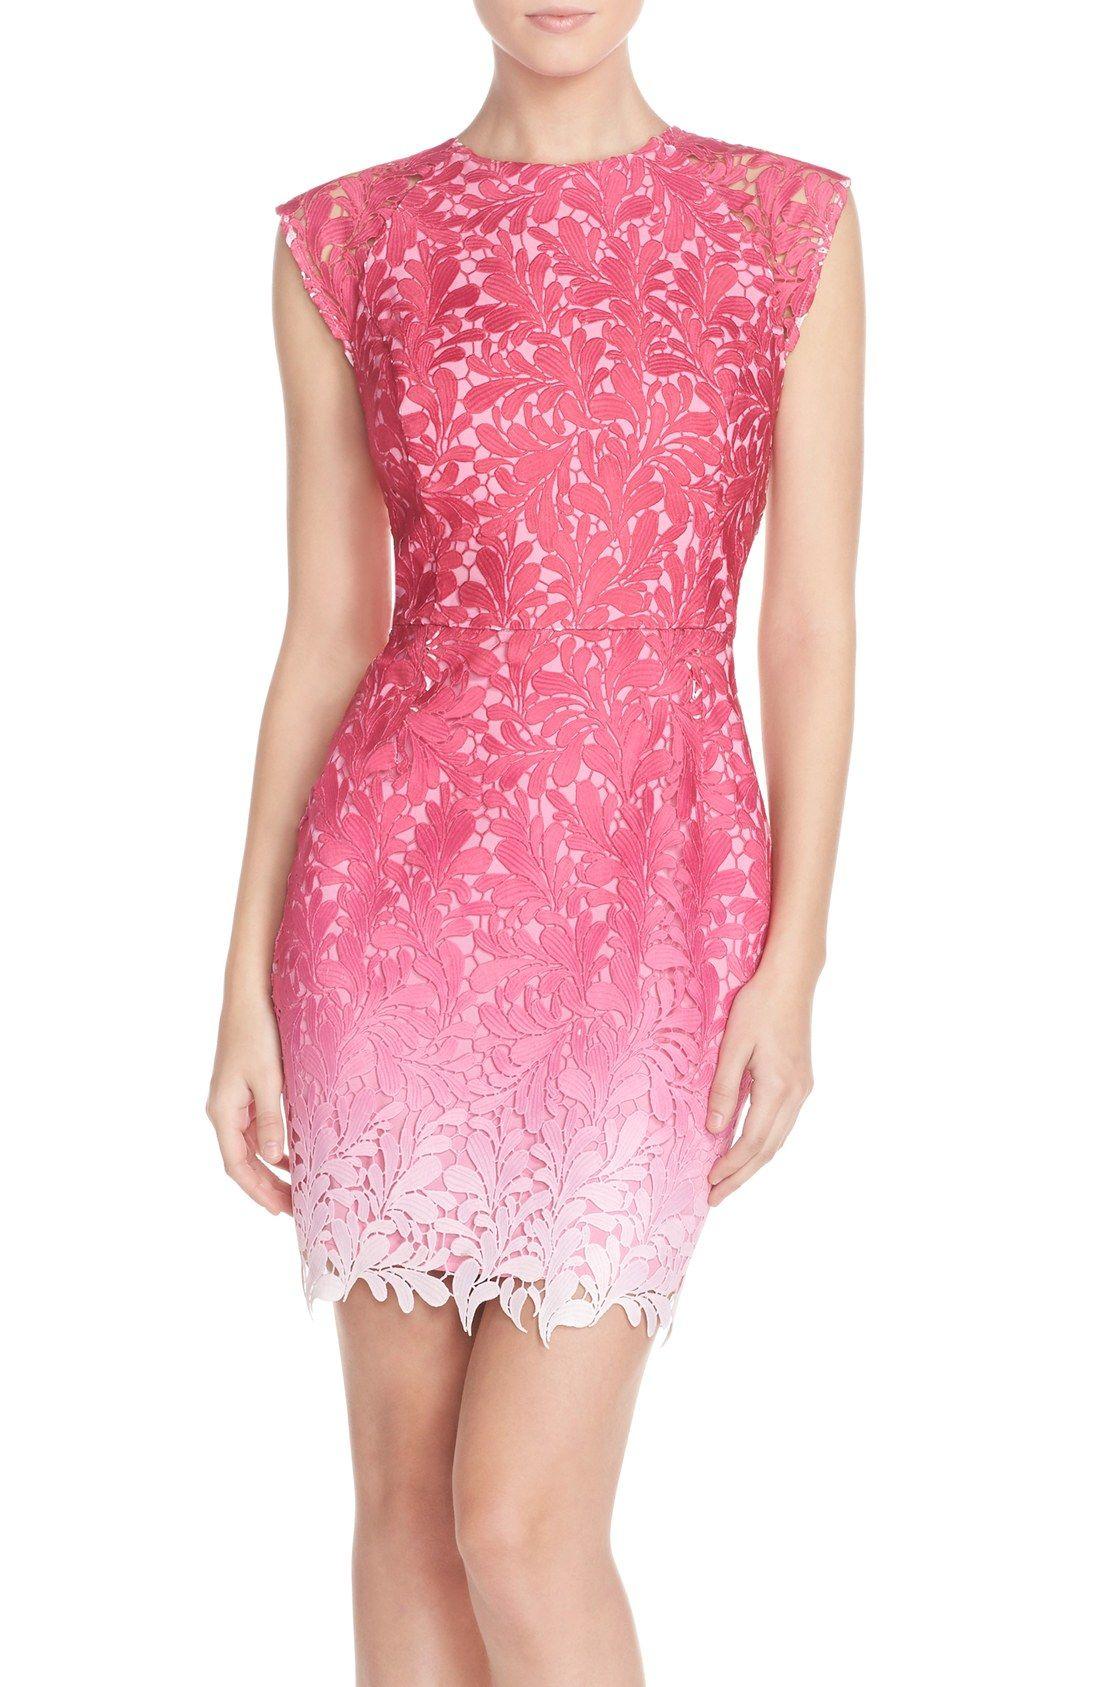 Nordstrom dresses wedding guest  Adelyn Rae Ombré Lace Sheath Dress  Dress Me Up  Pinterest  Lace